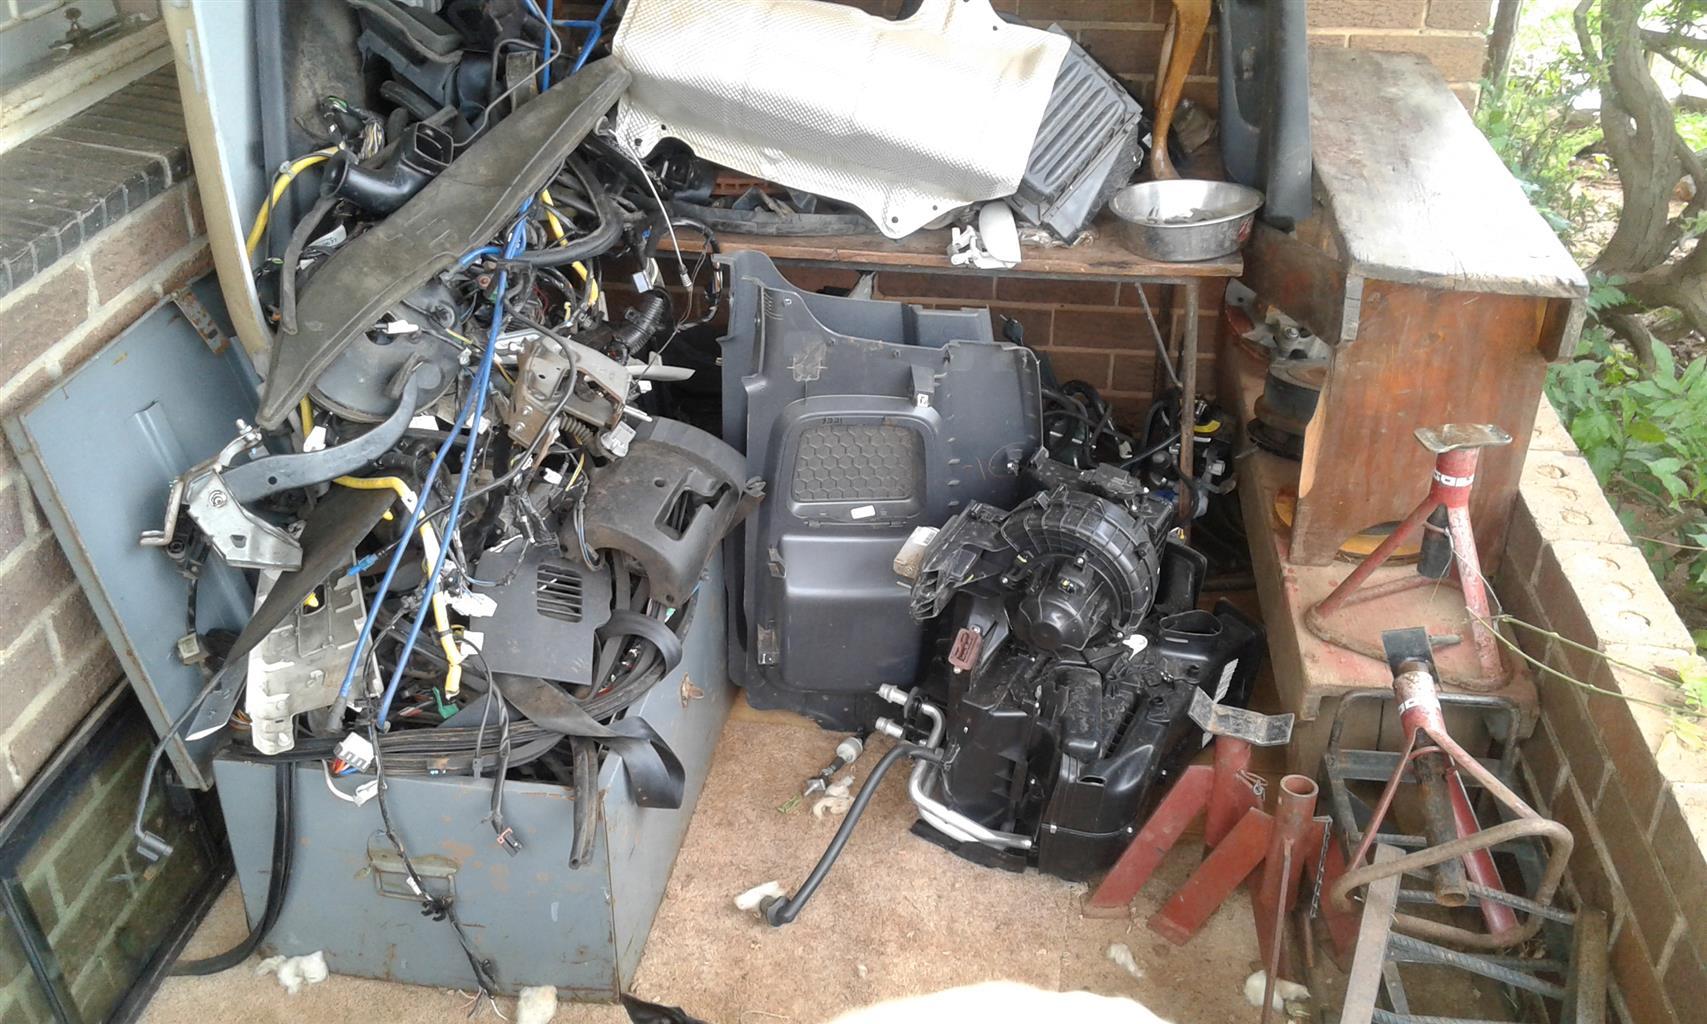 Hyundai i10 &Chev utility parts